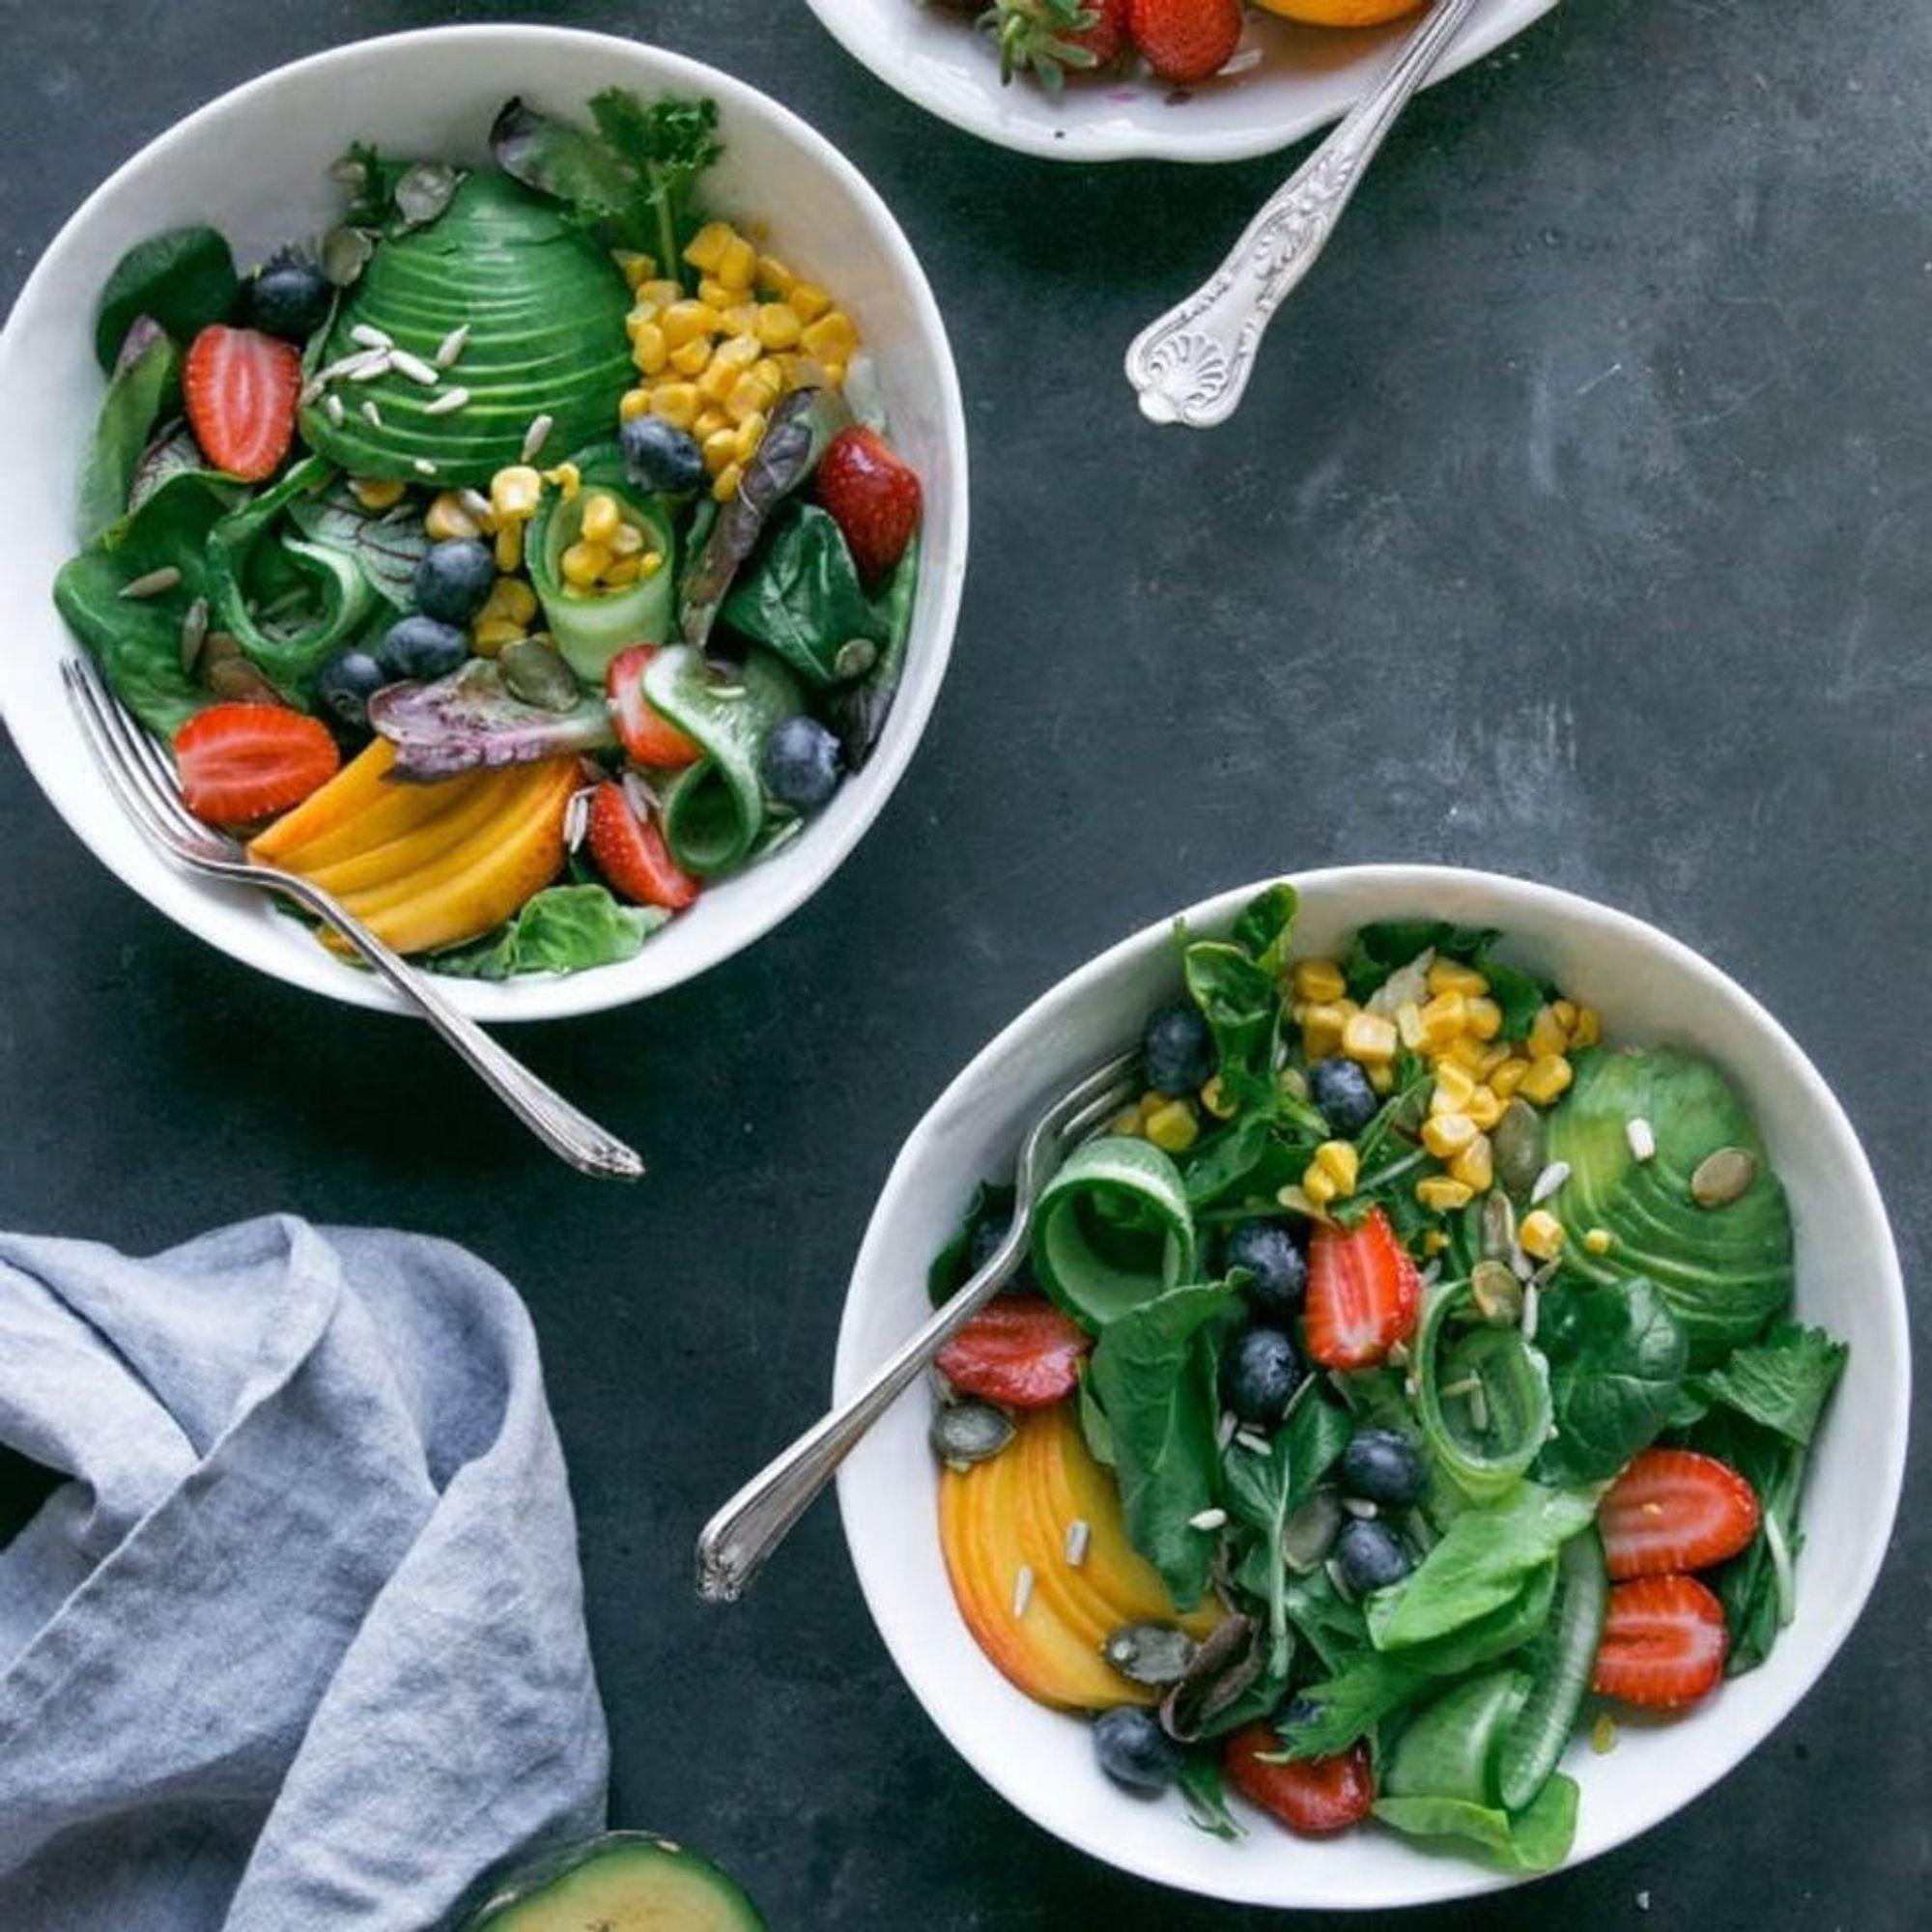 Healthy Salad Recipes cover image